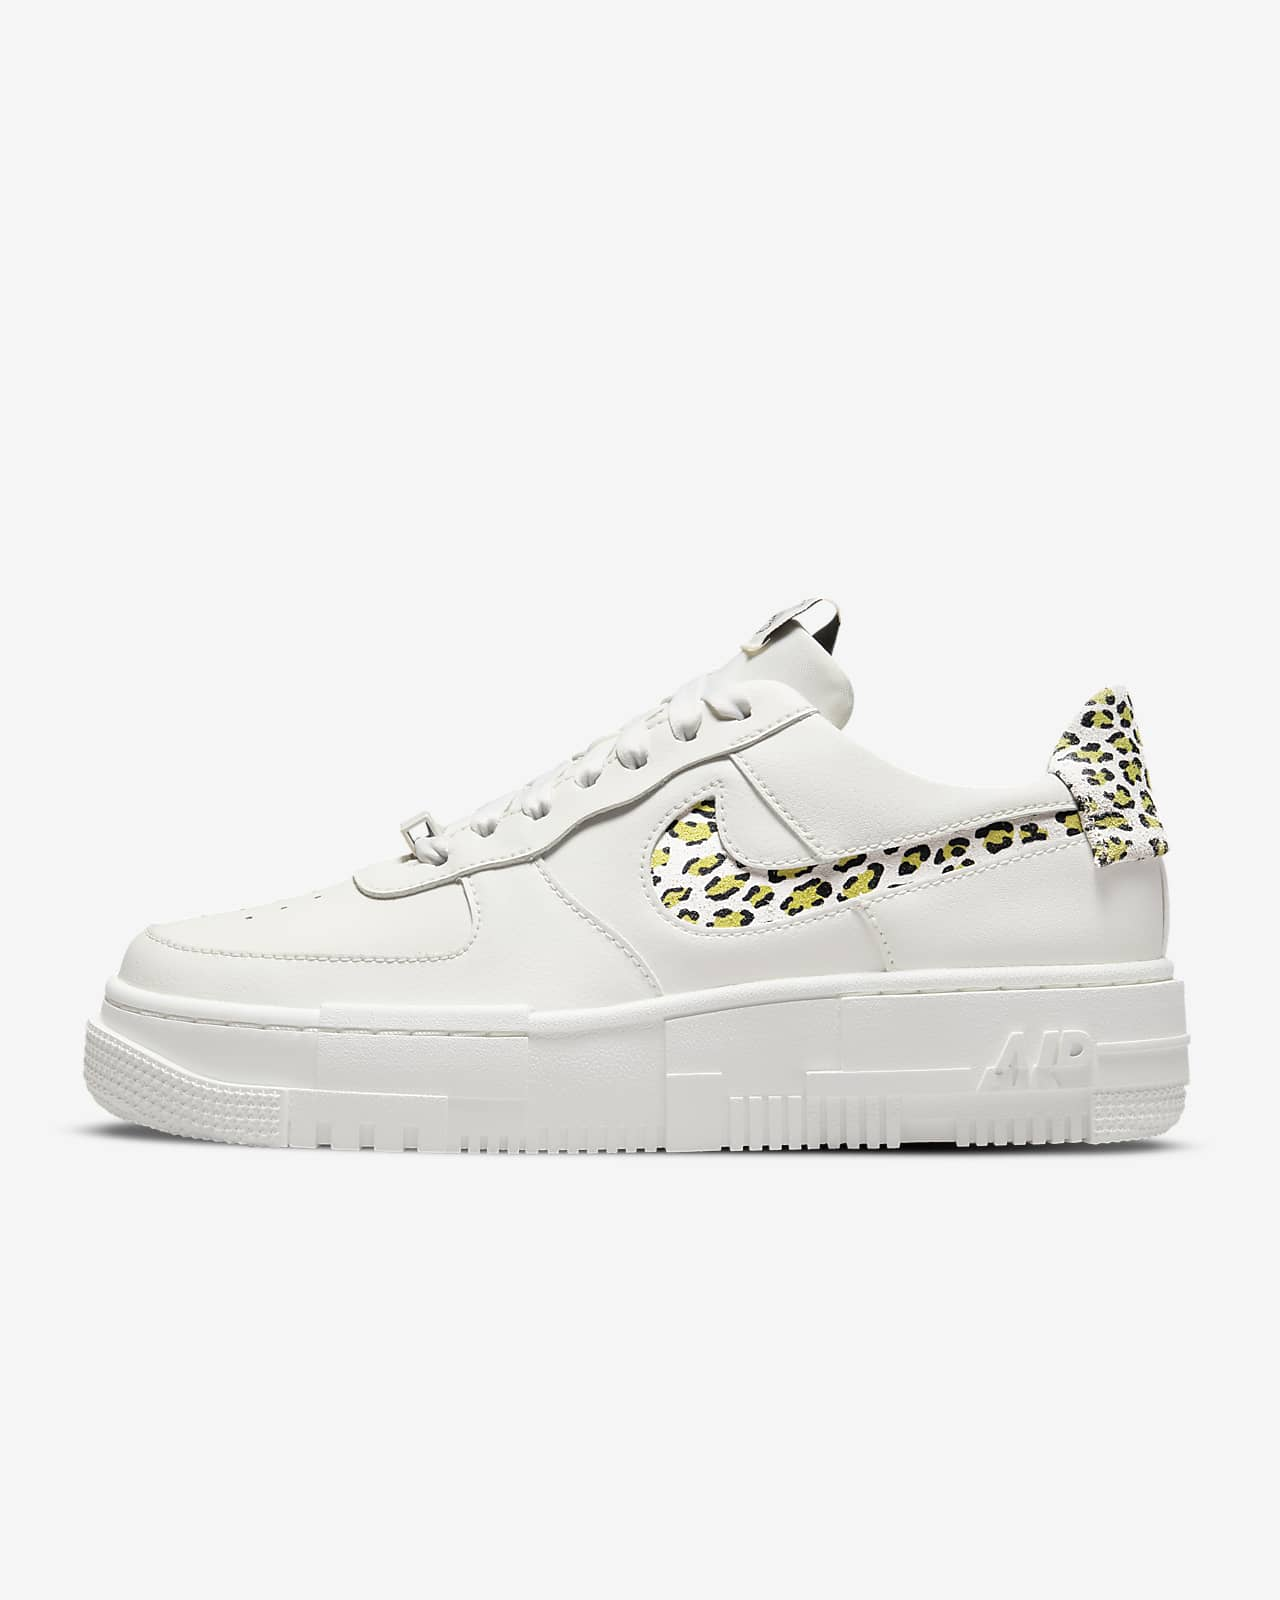 Nike Air Force 1 Pixel SE Women's Shoes